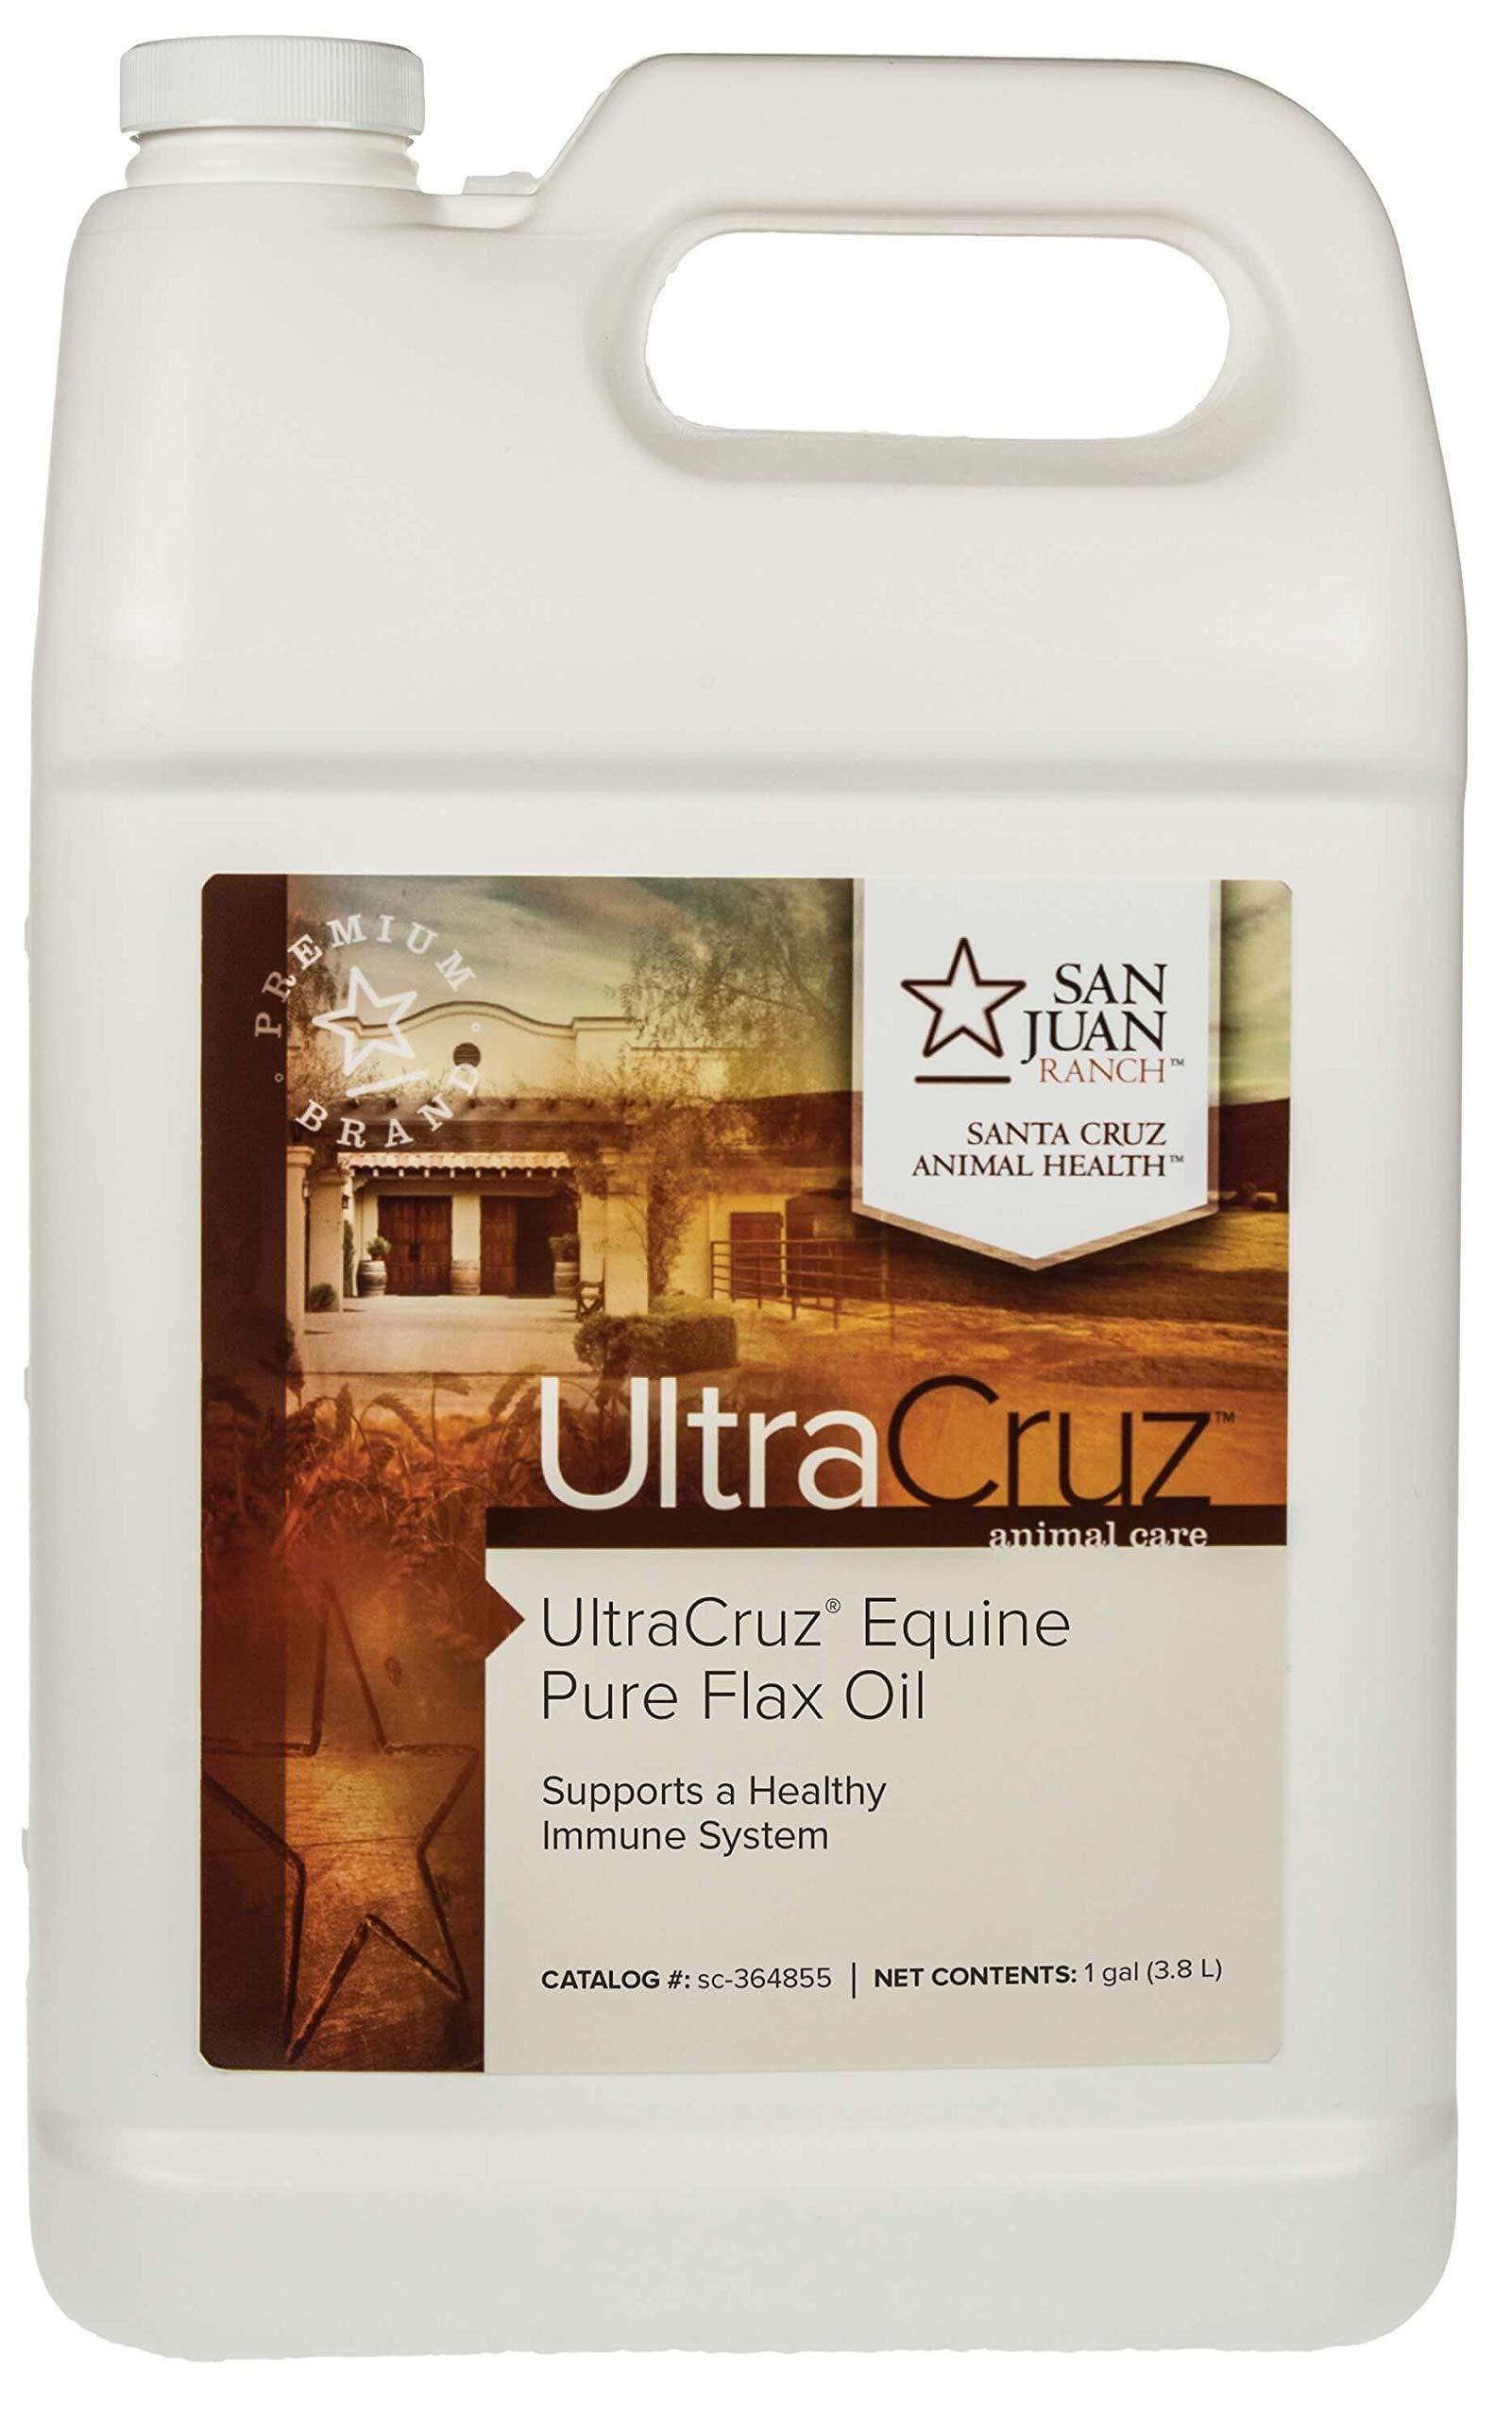 UltraCruz Pure Flax Oil Supplement for Horses and Livestock, 1 Gallon, Liquid by UltraCruz (Image #1)